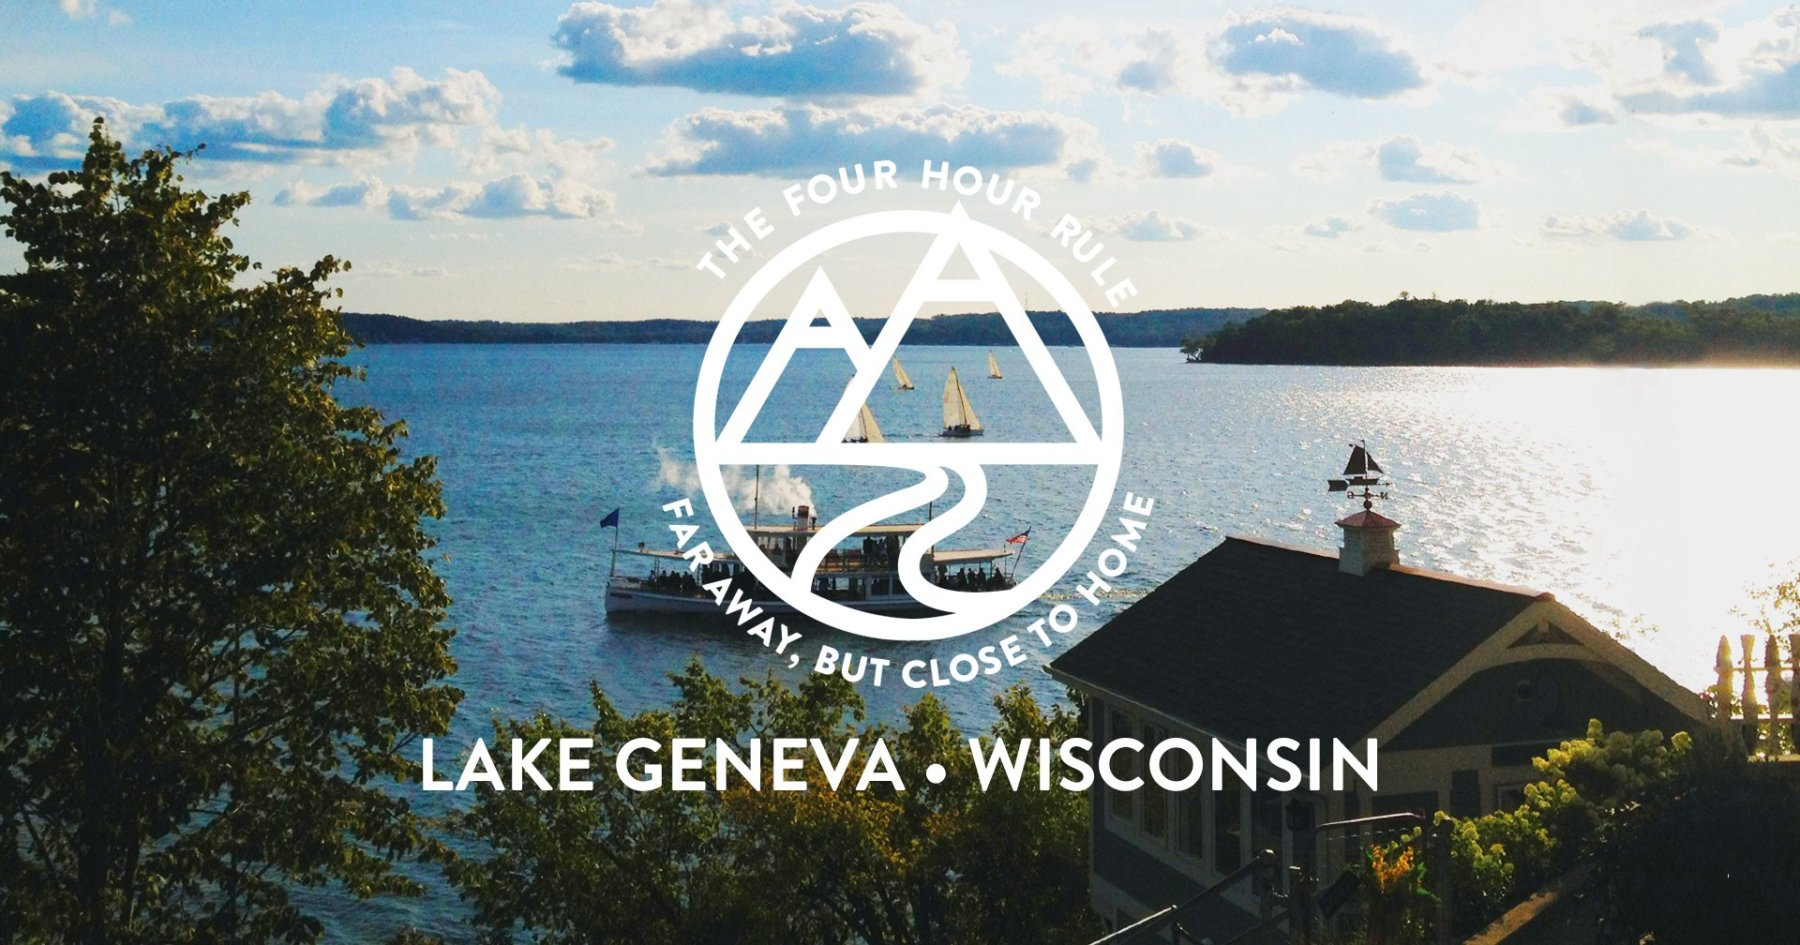 The Four-Hour Rule: Lake Geneva